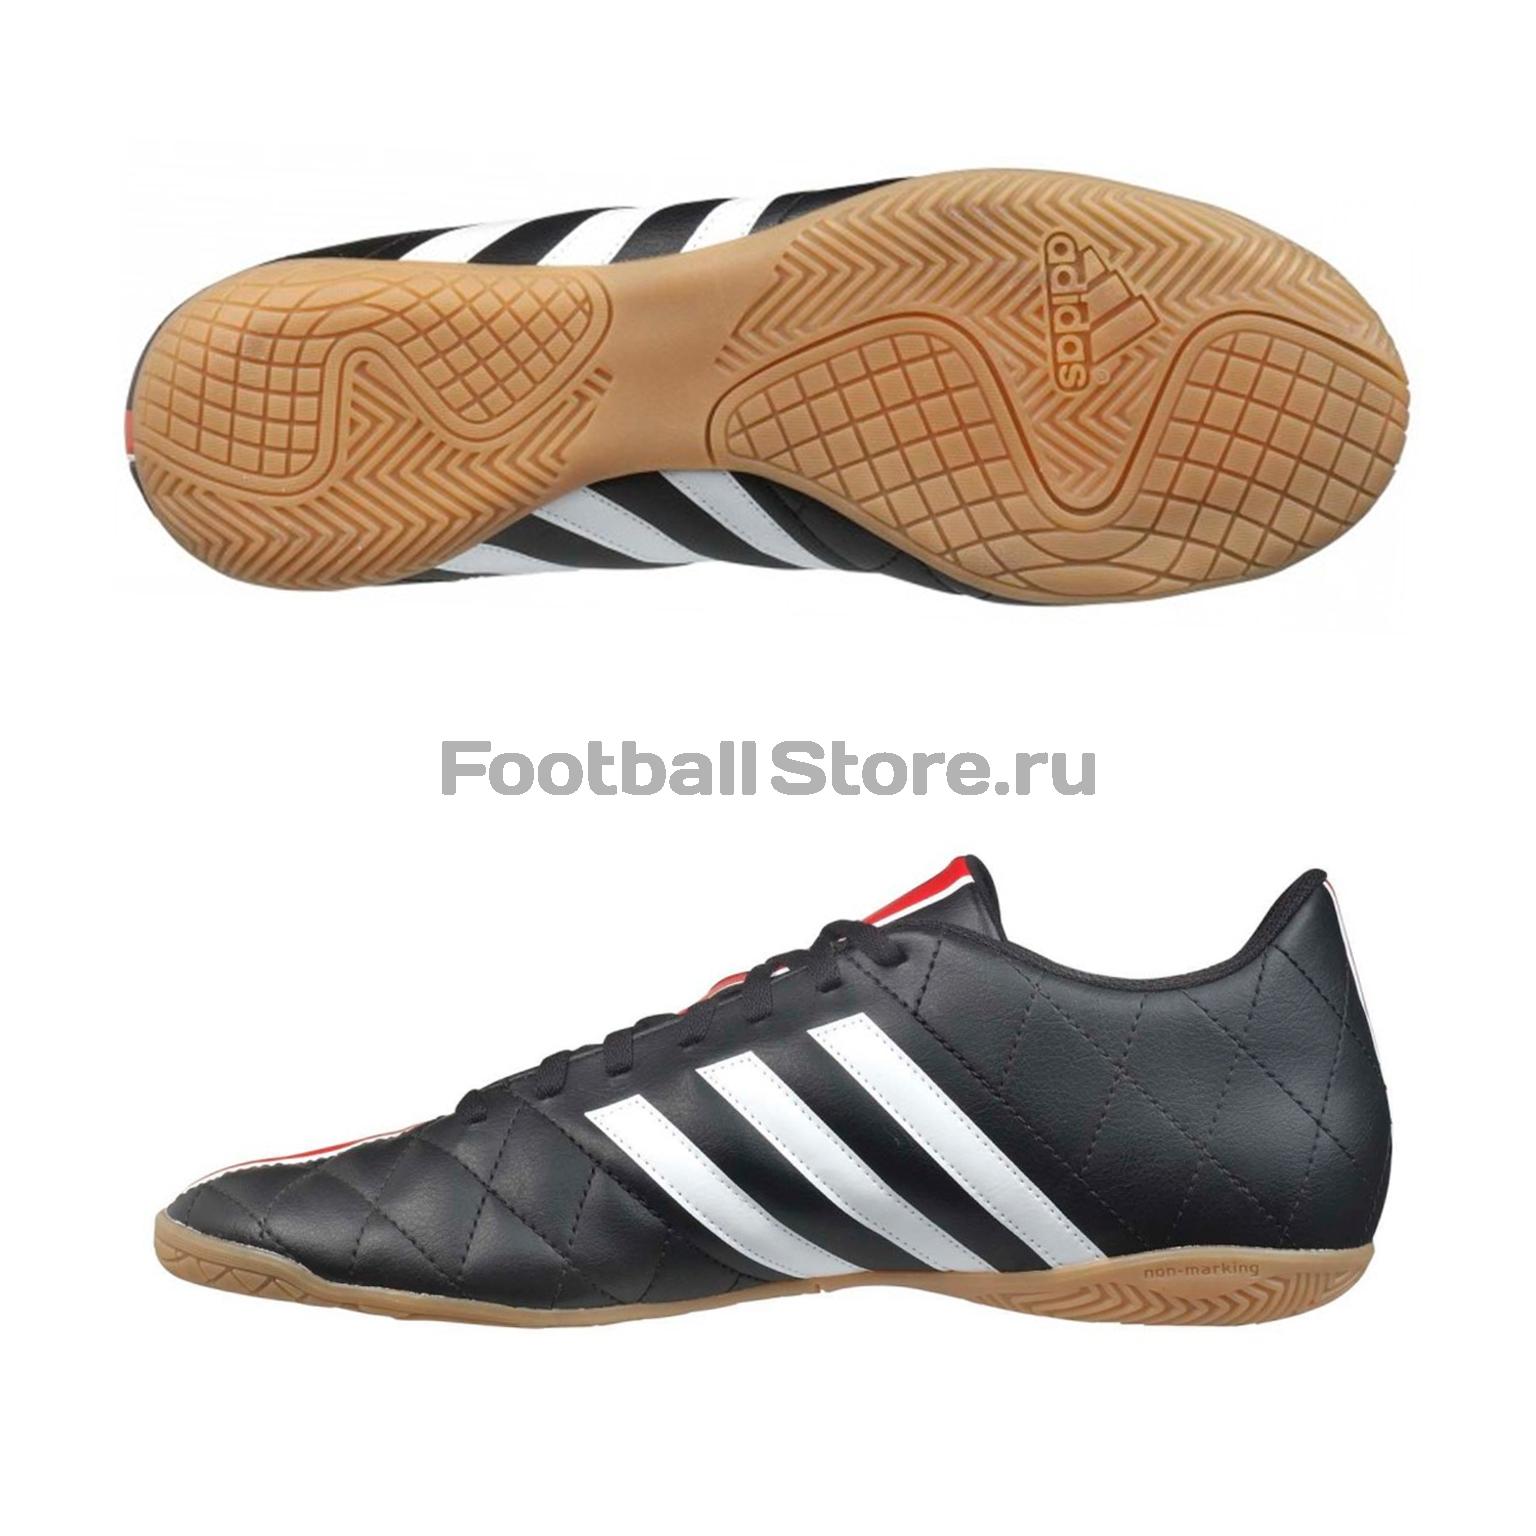 998bbb08 Обувь для зала Adidas Adipure 11Questra IN B36031 – купить футзалки в  интернет магазине footballstore, цена, фото